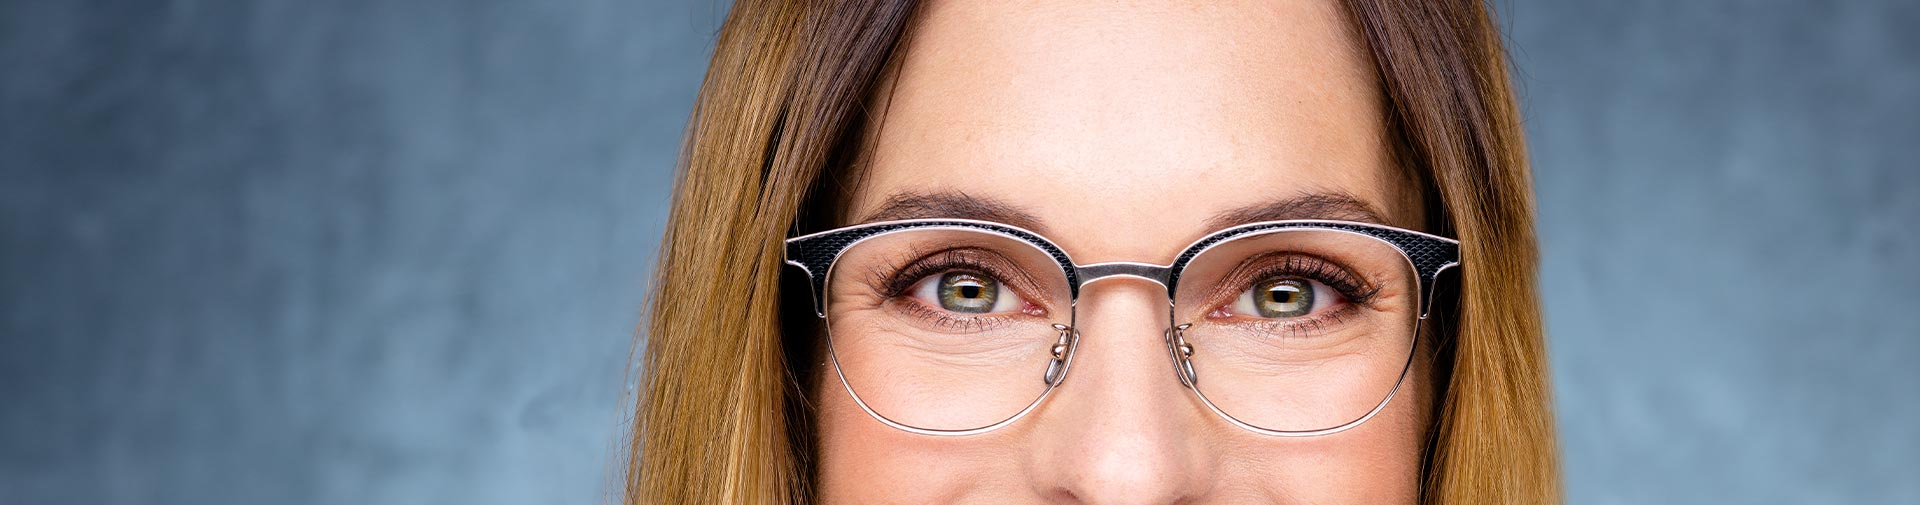 Funk Optics Funk Germany Sonnenbrille weiß fast neu! Super schöne Brille!